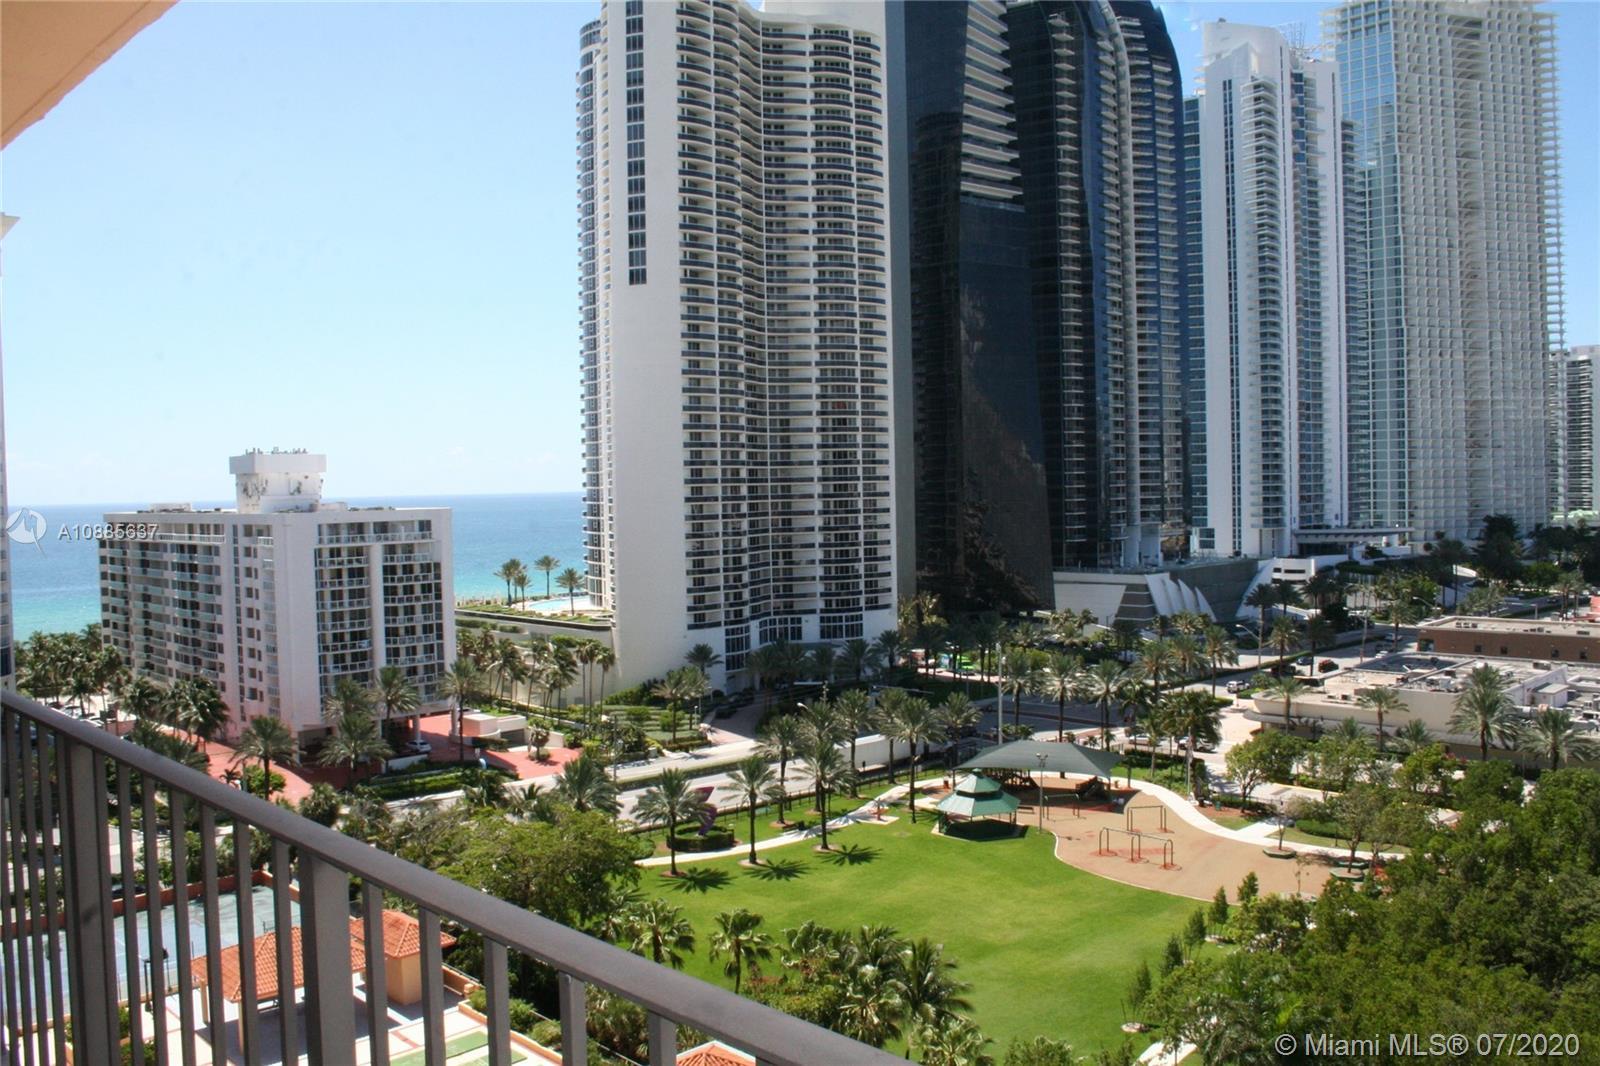 Winston Tower 600 #1506 - 210 174th St #1506, Sunny Isles Beach, FL 33160